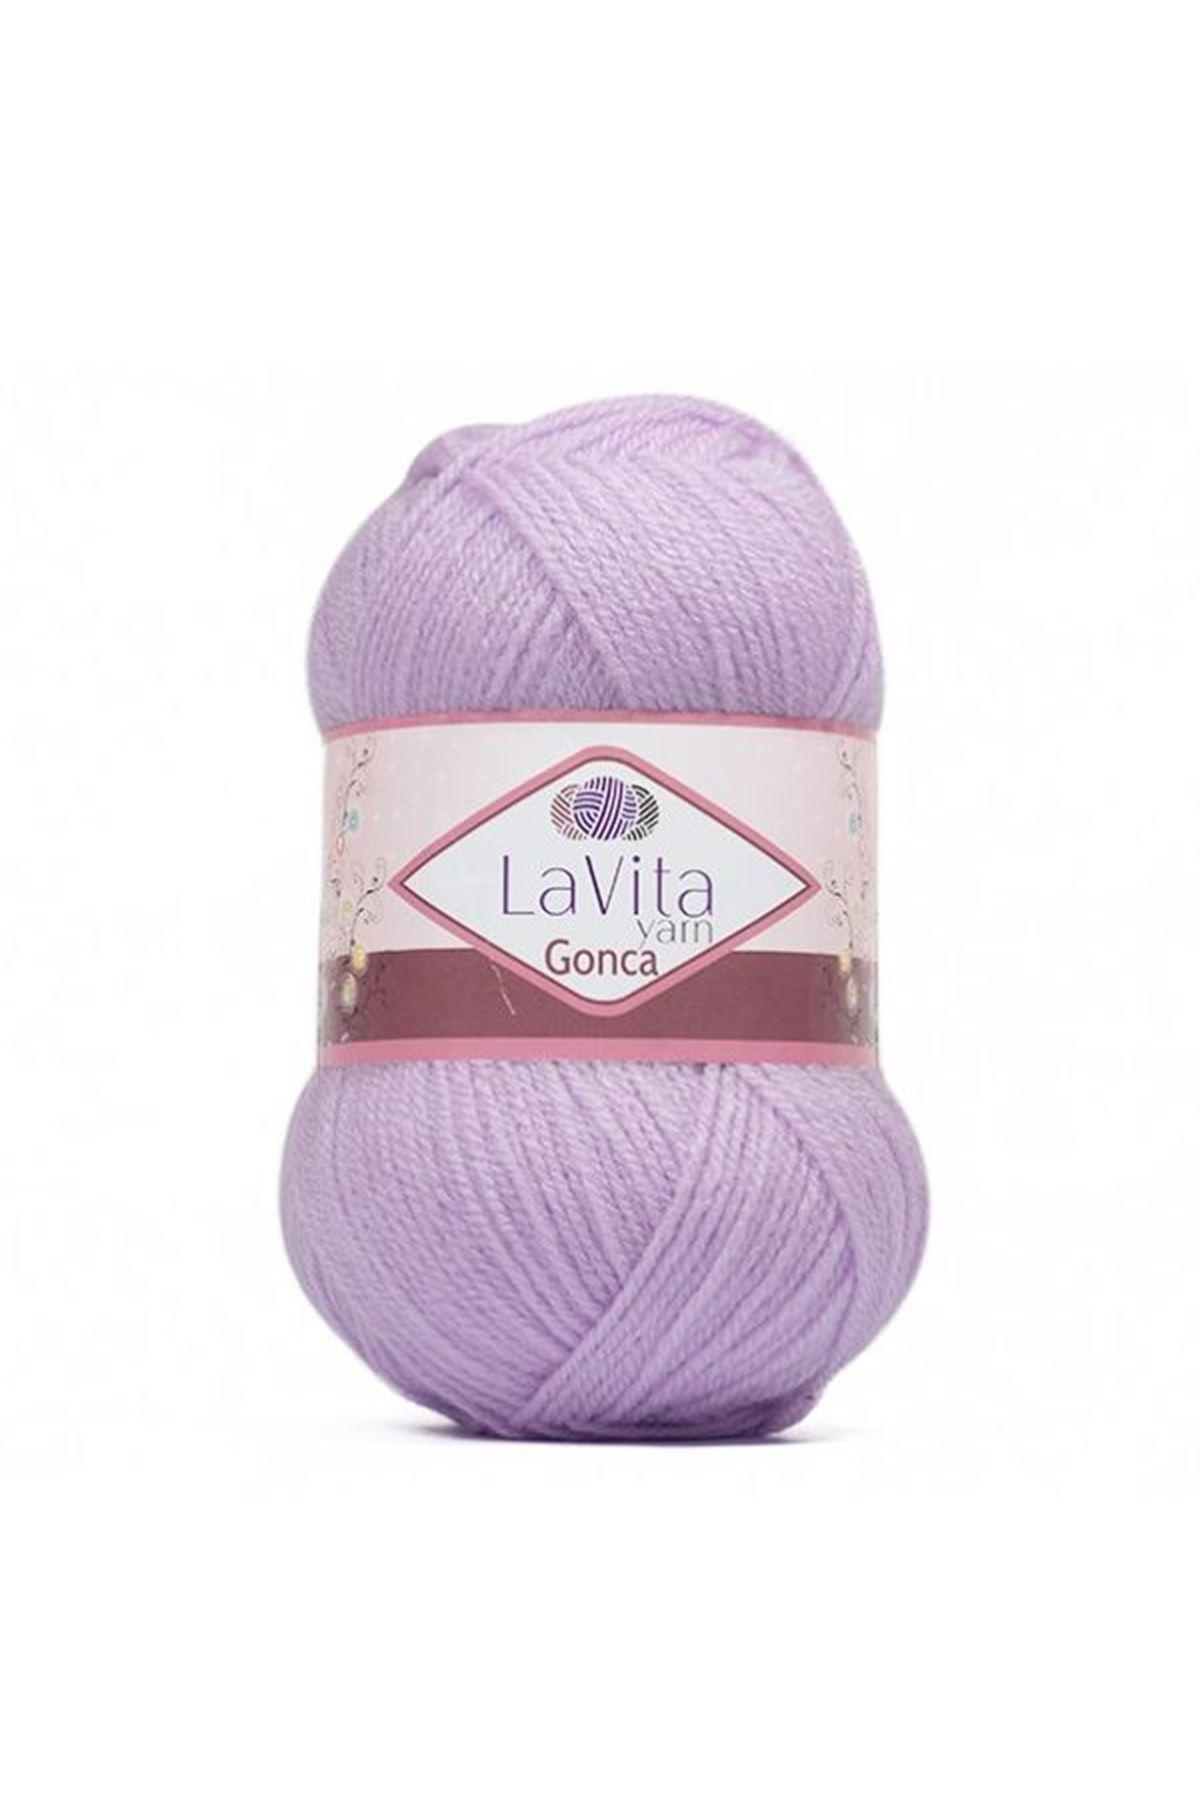 Lavita Gonca 5116 Lila